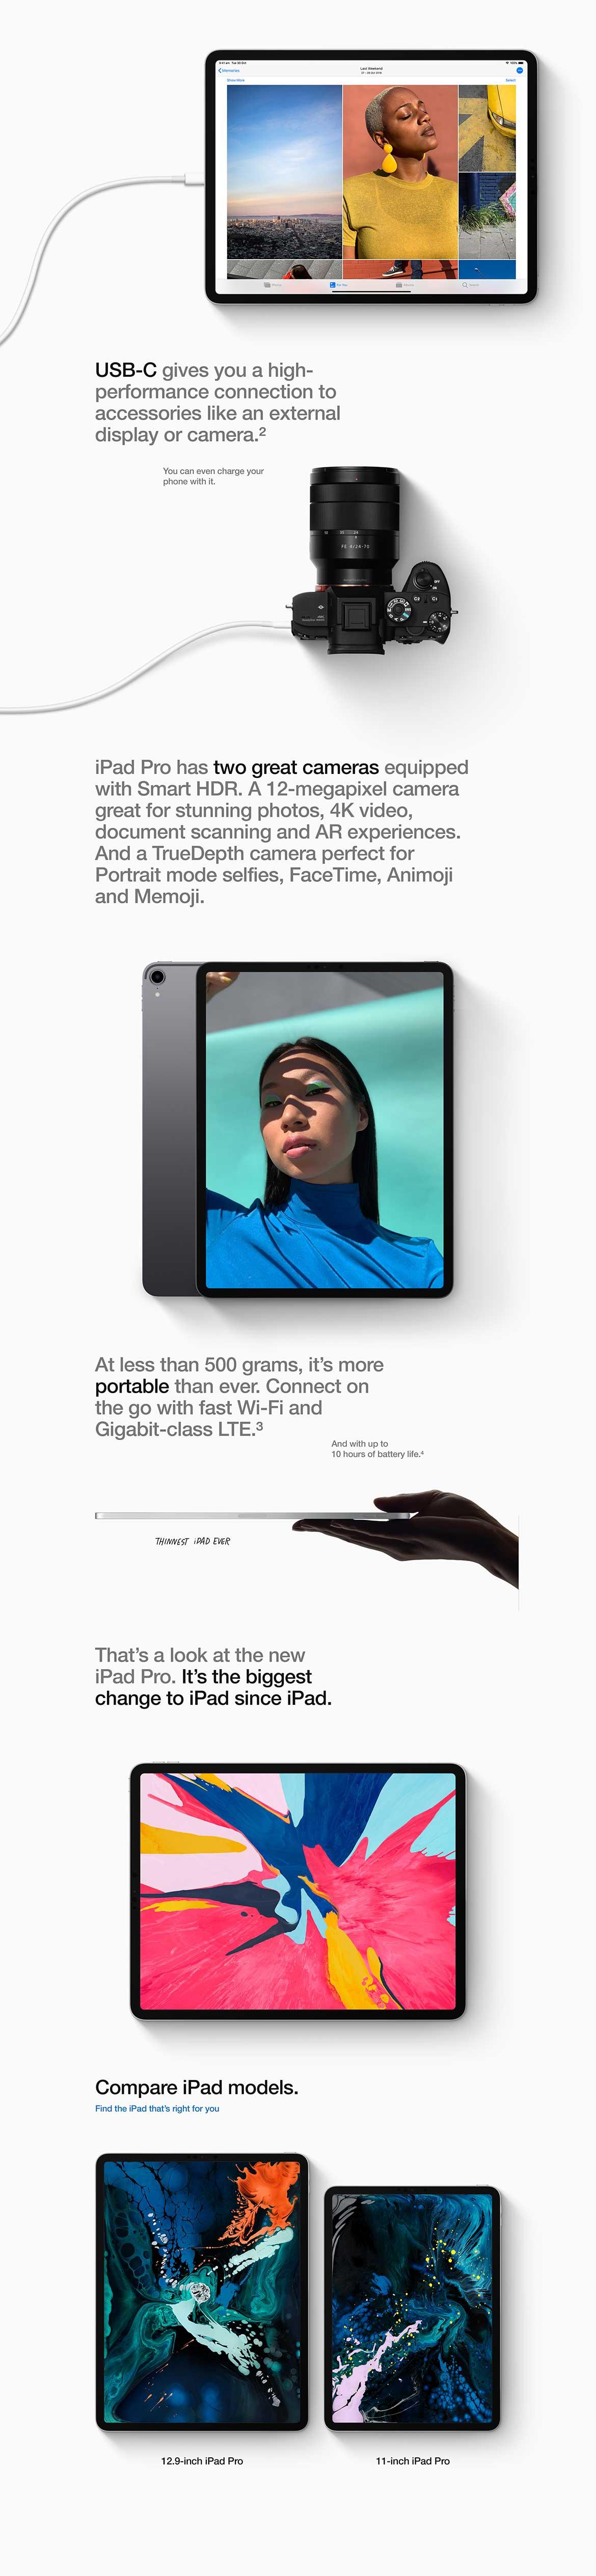 Tempat Jual Ipad Pro 129 Package Keyboard Rent From 66 Jam Tangan Qampampq Vr 42 Rubber Oranye Original 3 Inch Plans Optus Month Apple Pencil And